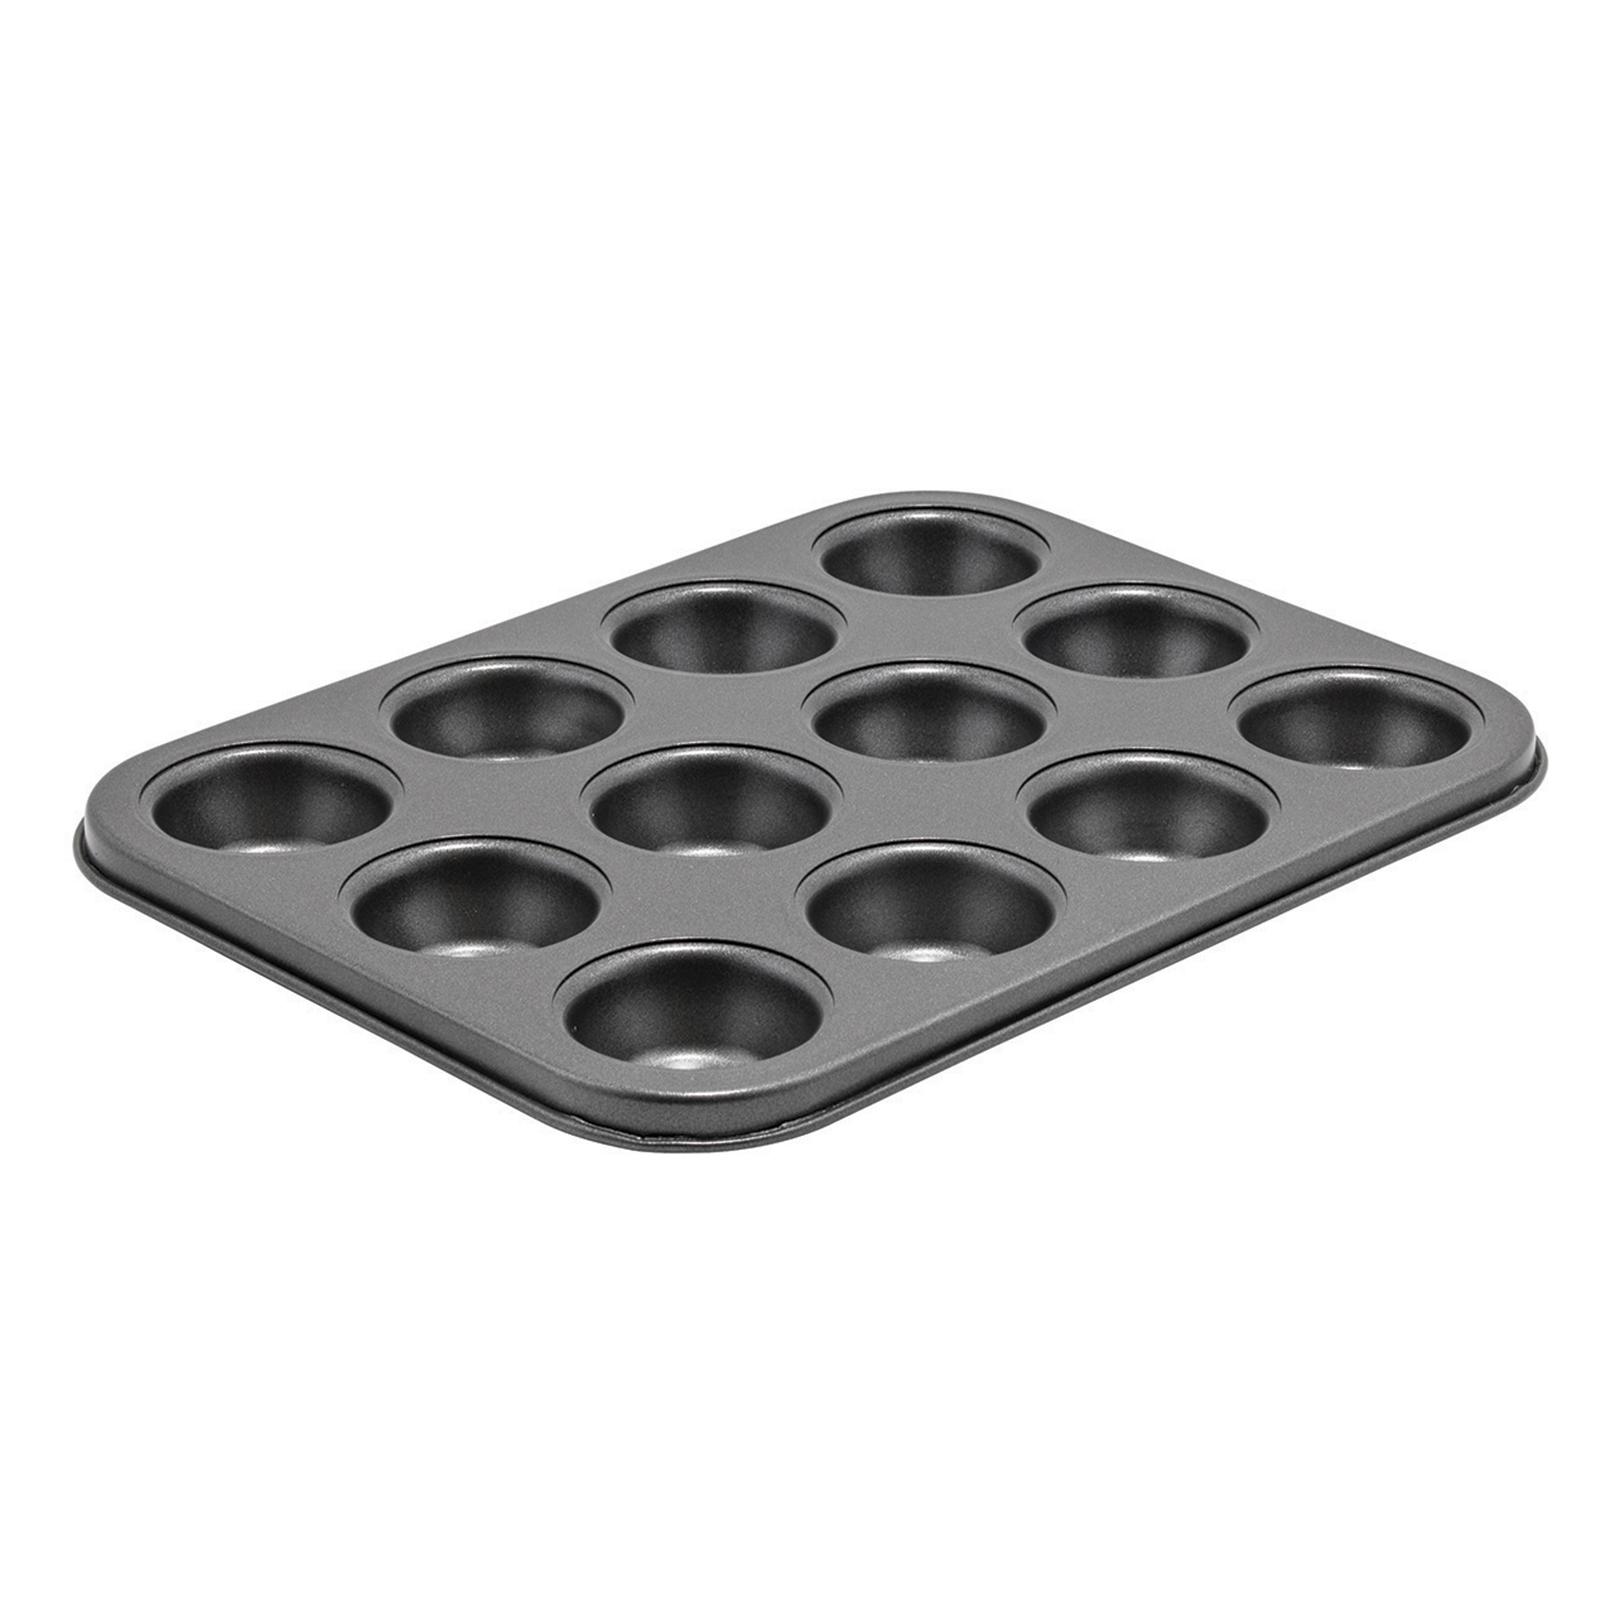 Winco CMF-12M muffin pan